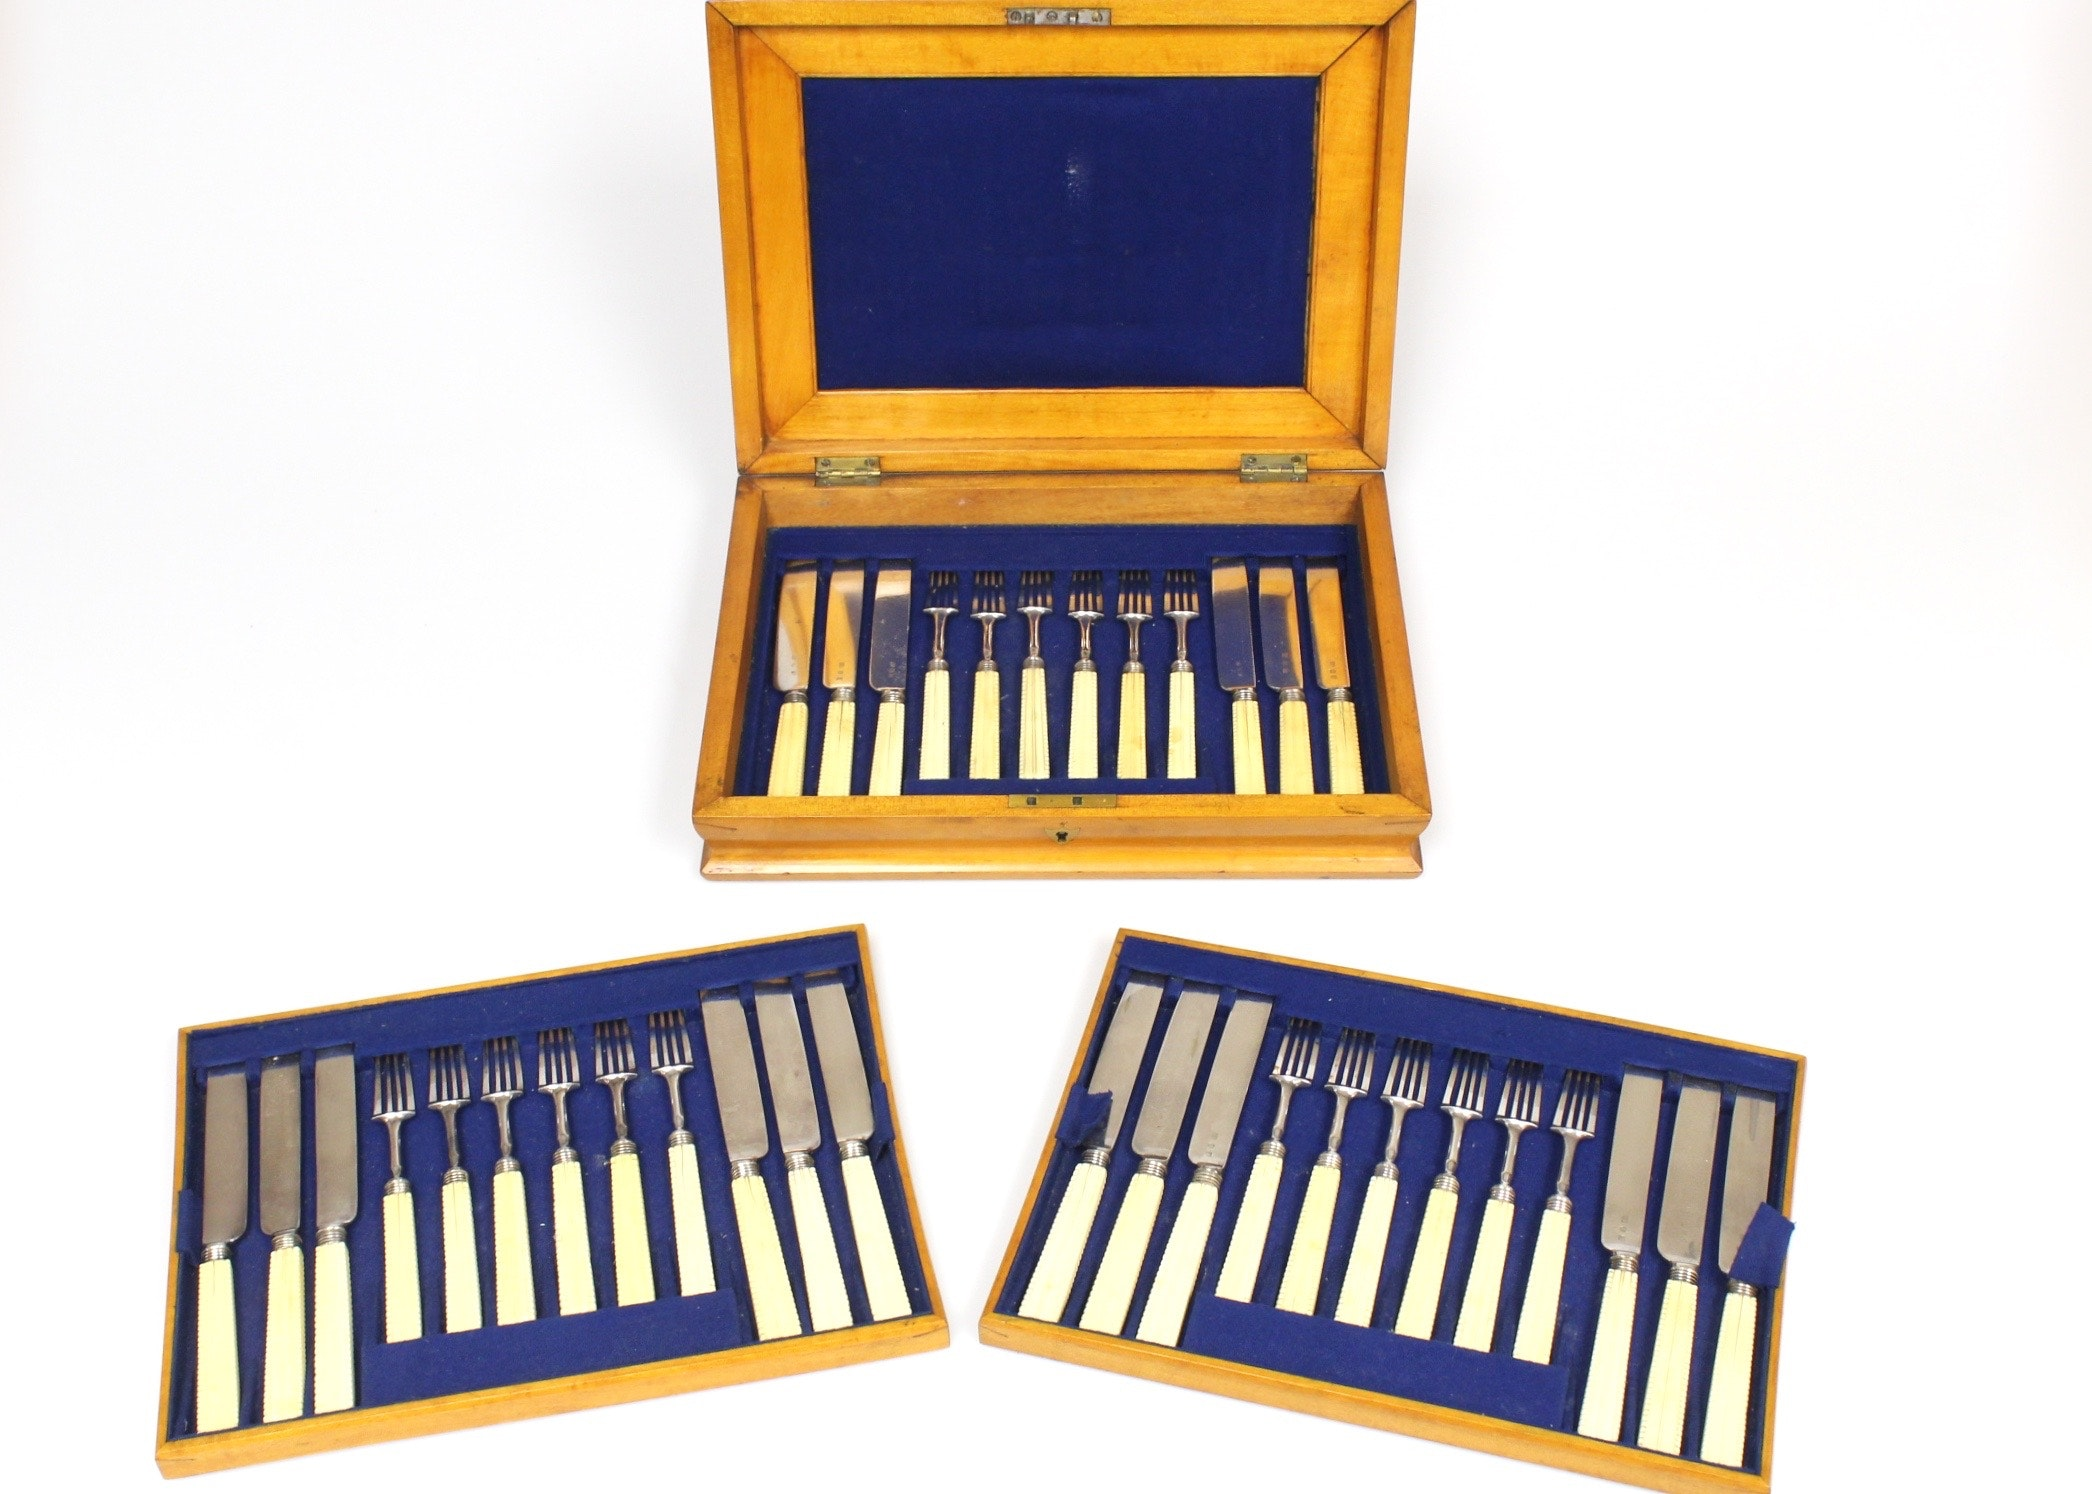 IMG 6248.jpg?ixlib=rb 1.1 - Lovely Ivory Handled Knives Antique